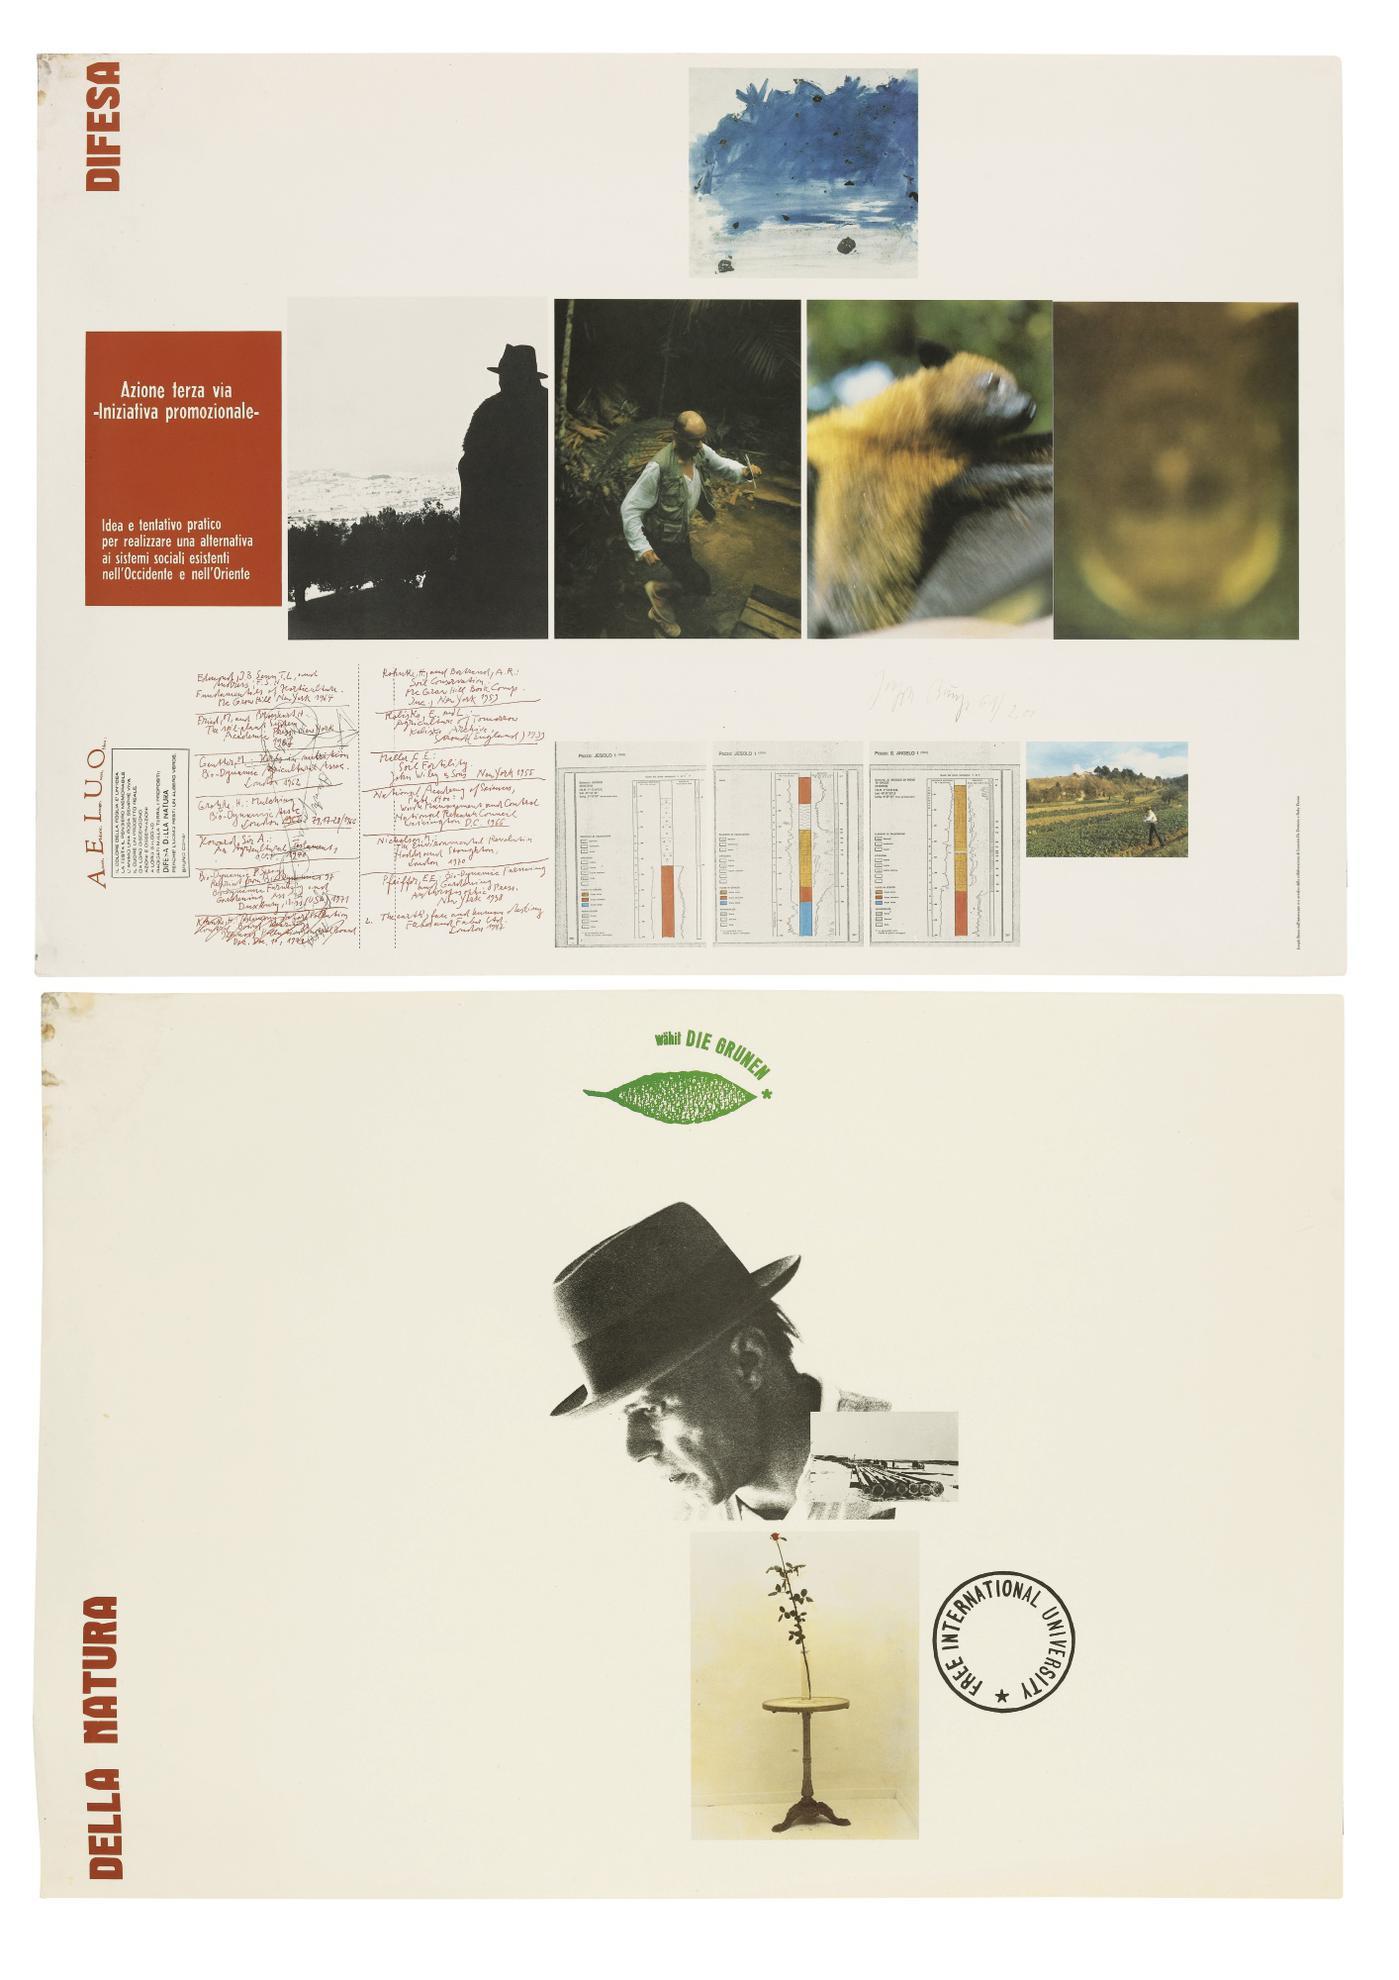 Joseph Beuys-A.E.I.O.U. (Difesa Della Natura) (Diptyque)-1983